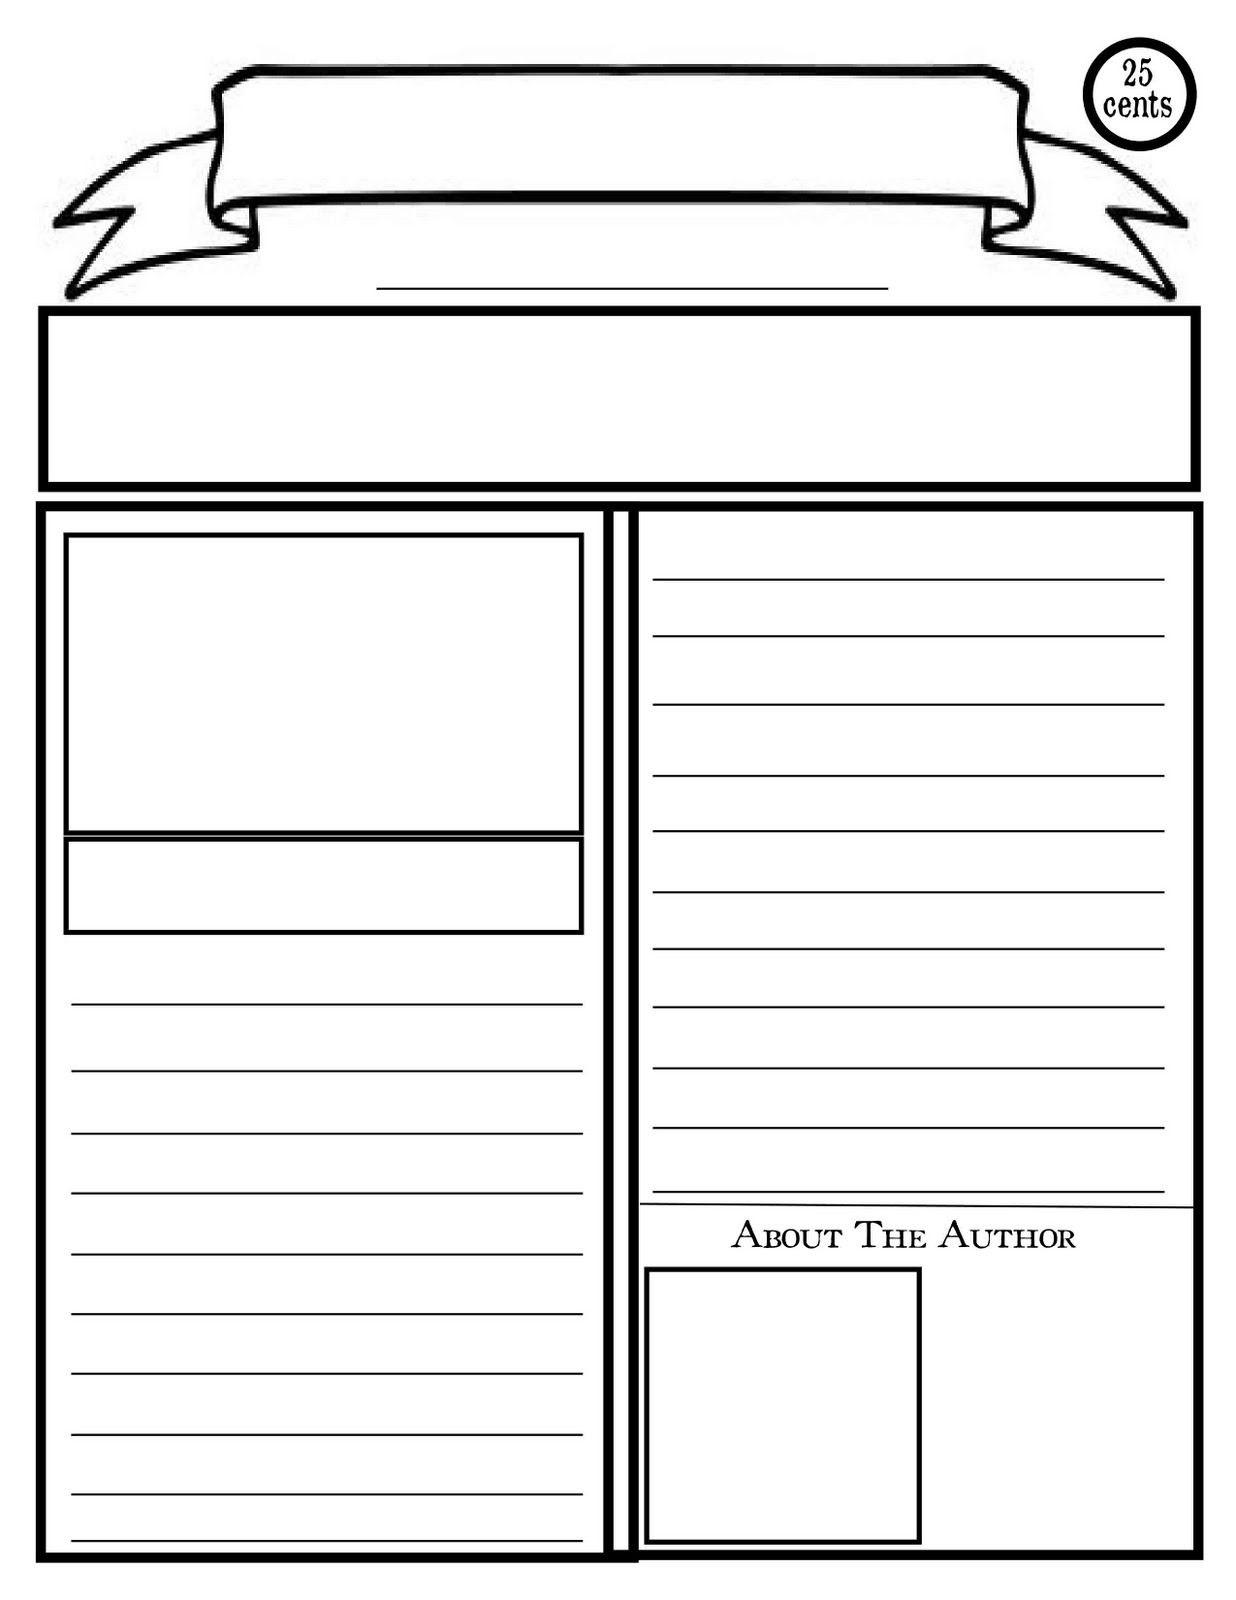 Blank Newspaper Template For Kids Printable  Homework Help For News Report Template